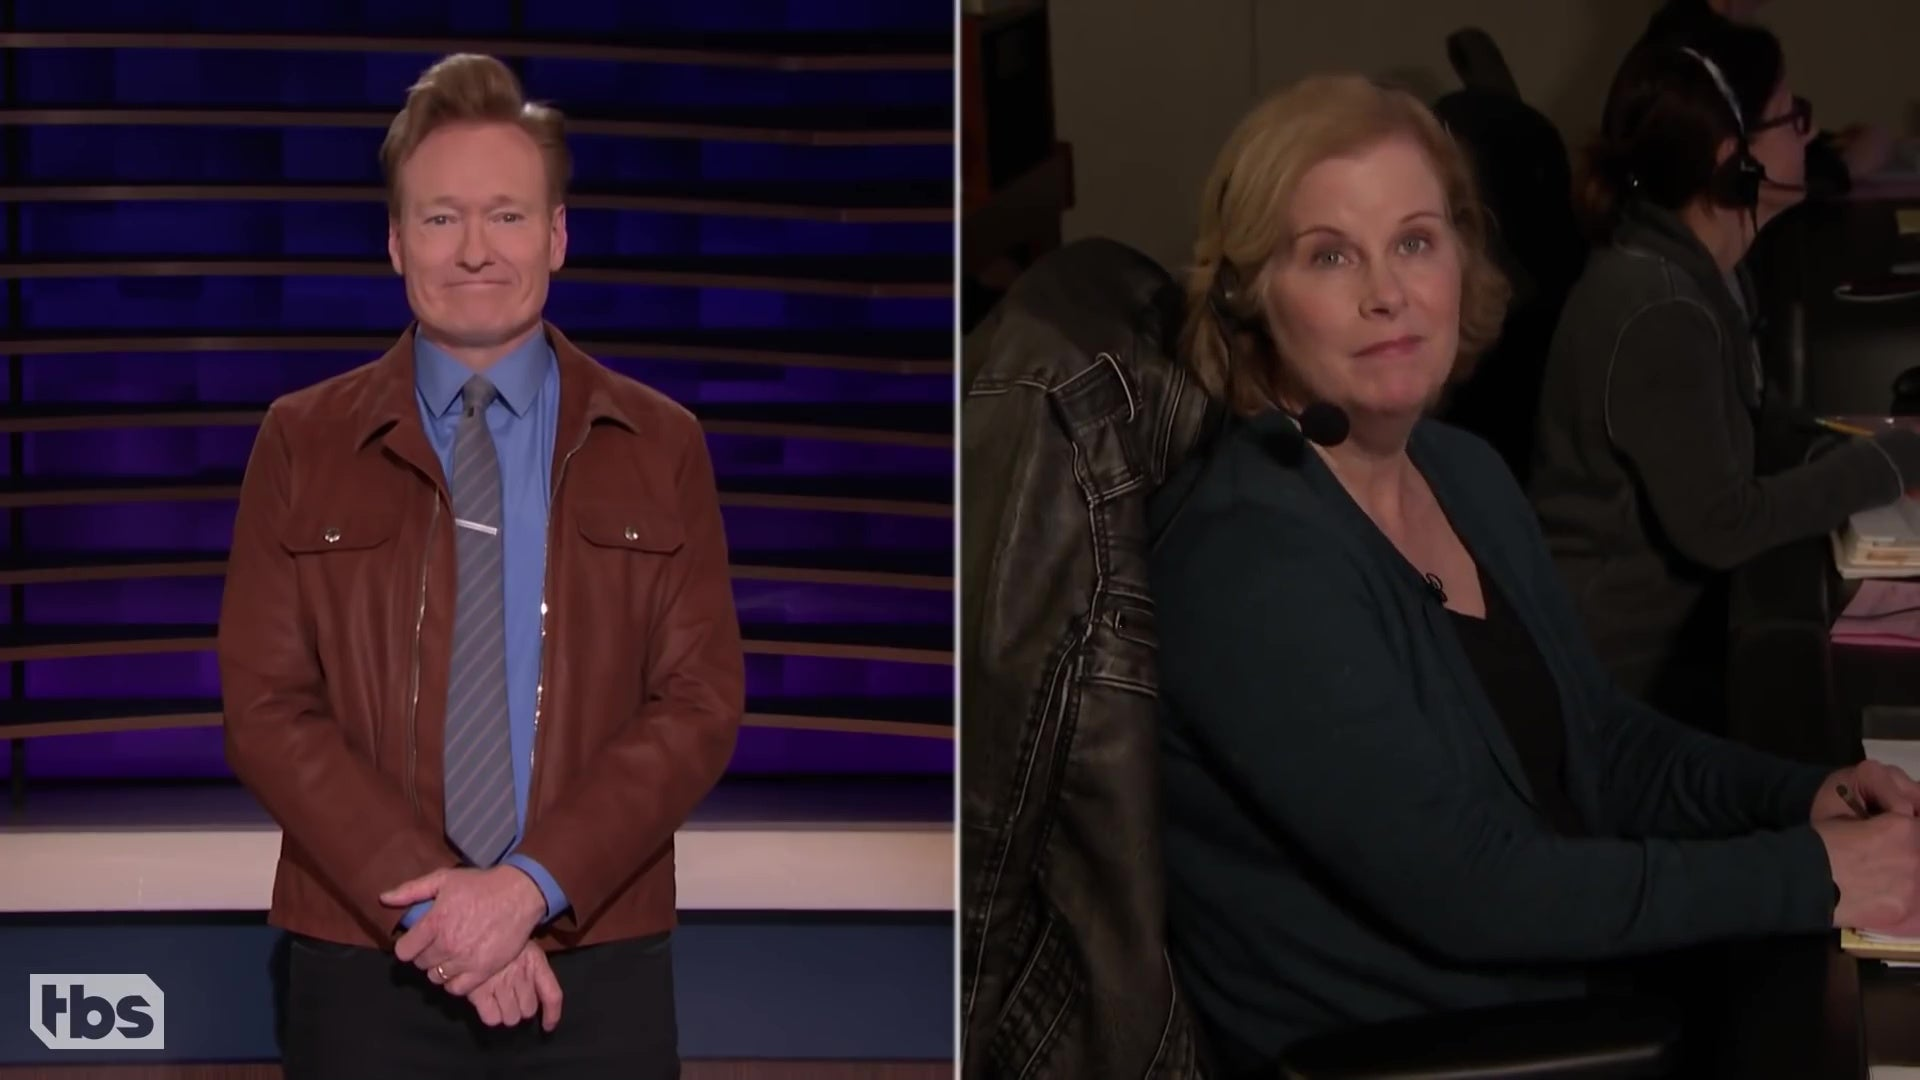 Conan O'Brien in a split screen with his show's director Billie Bollotino.